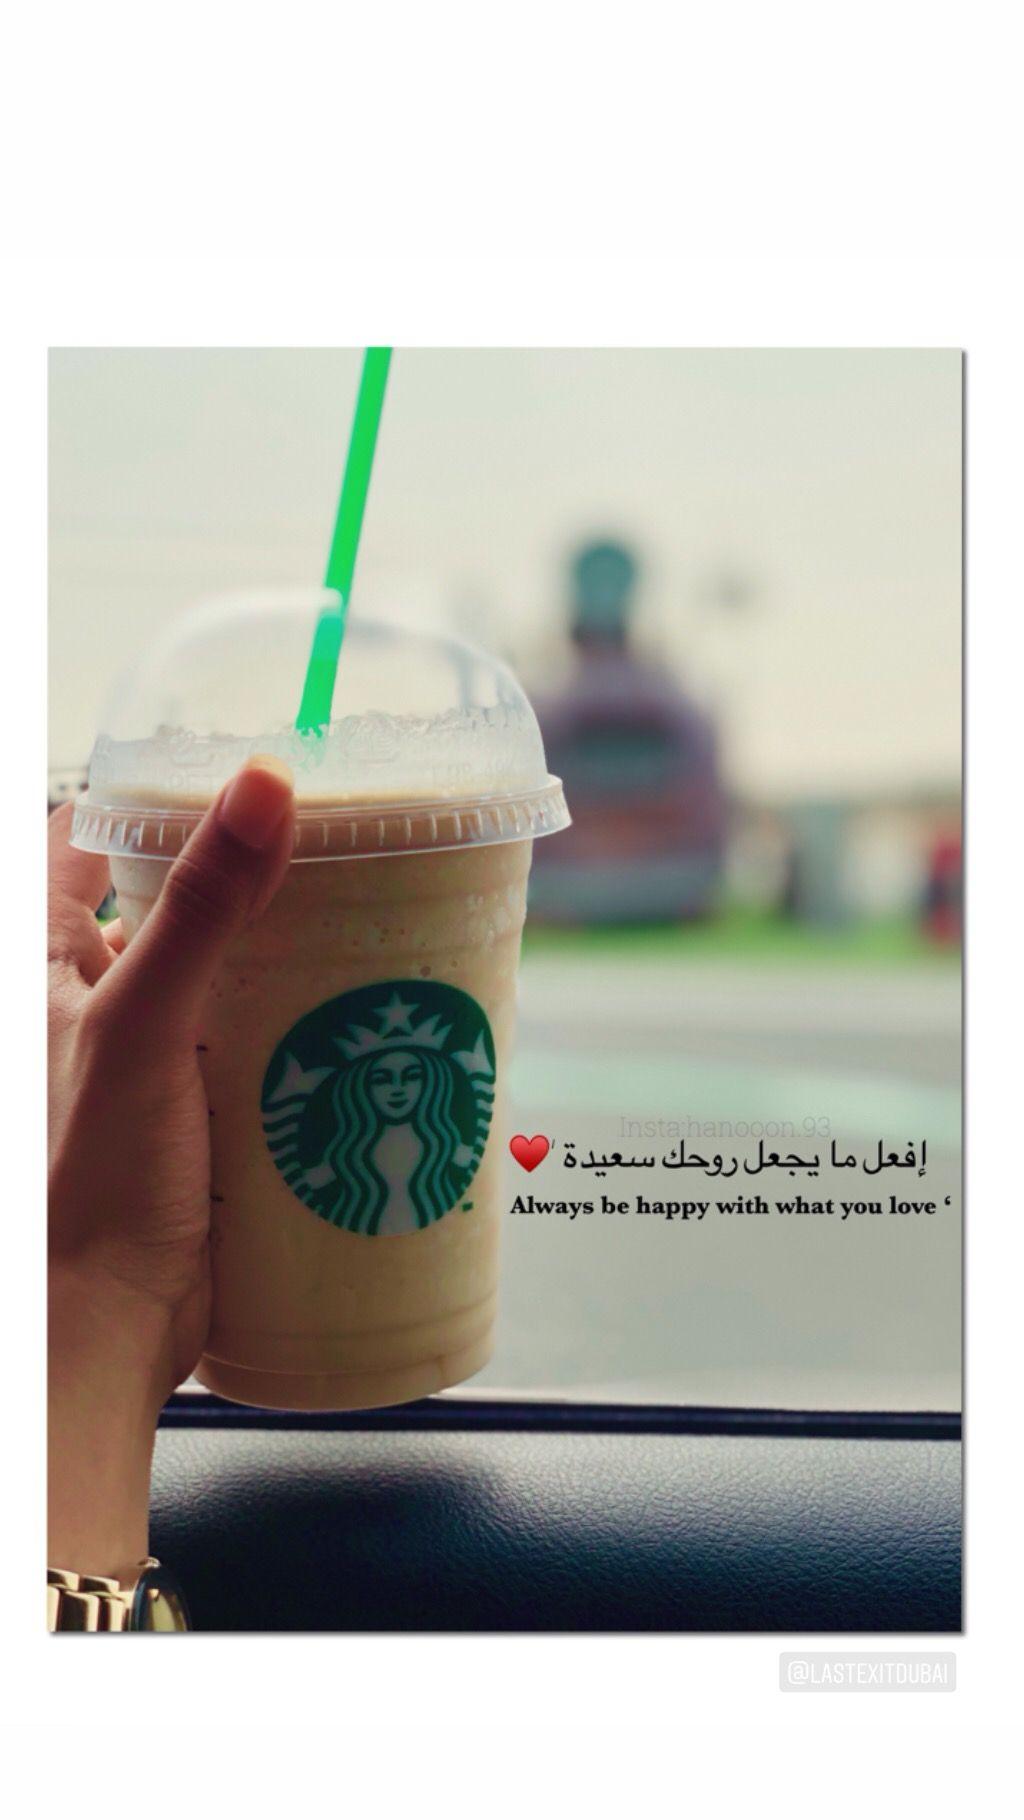 Starbucks Mydubai Coffee تصويري ستاربكس تصوير منتجات تصوير Coffee Photos Starbucks Frappuccino Bottle Disney Cups